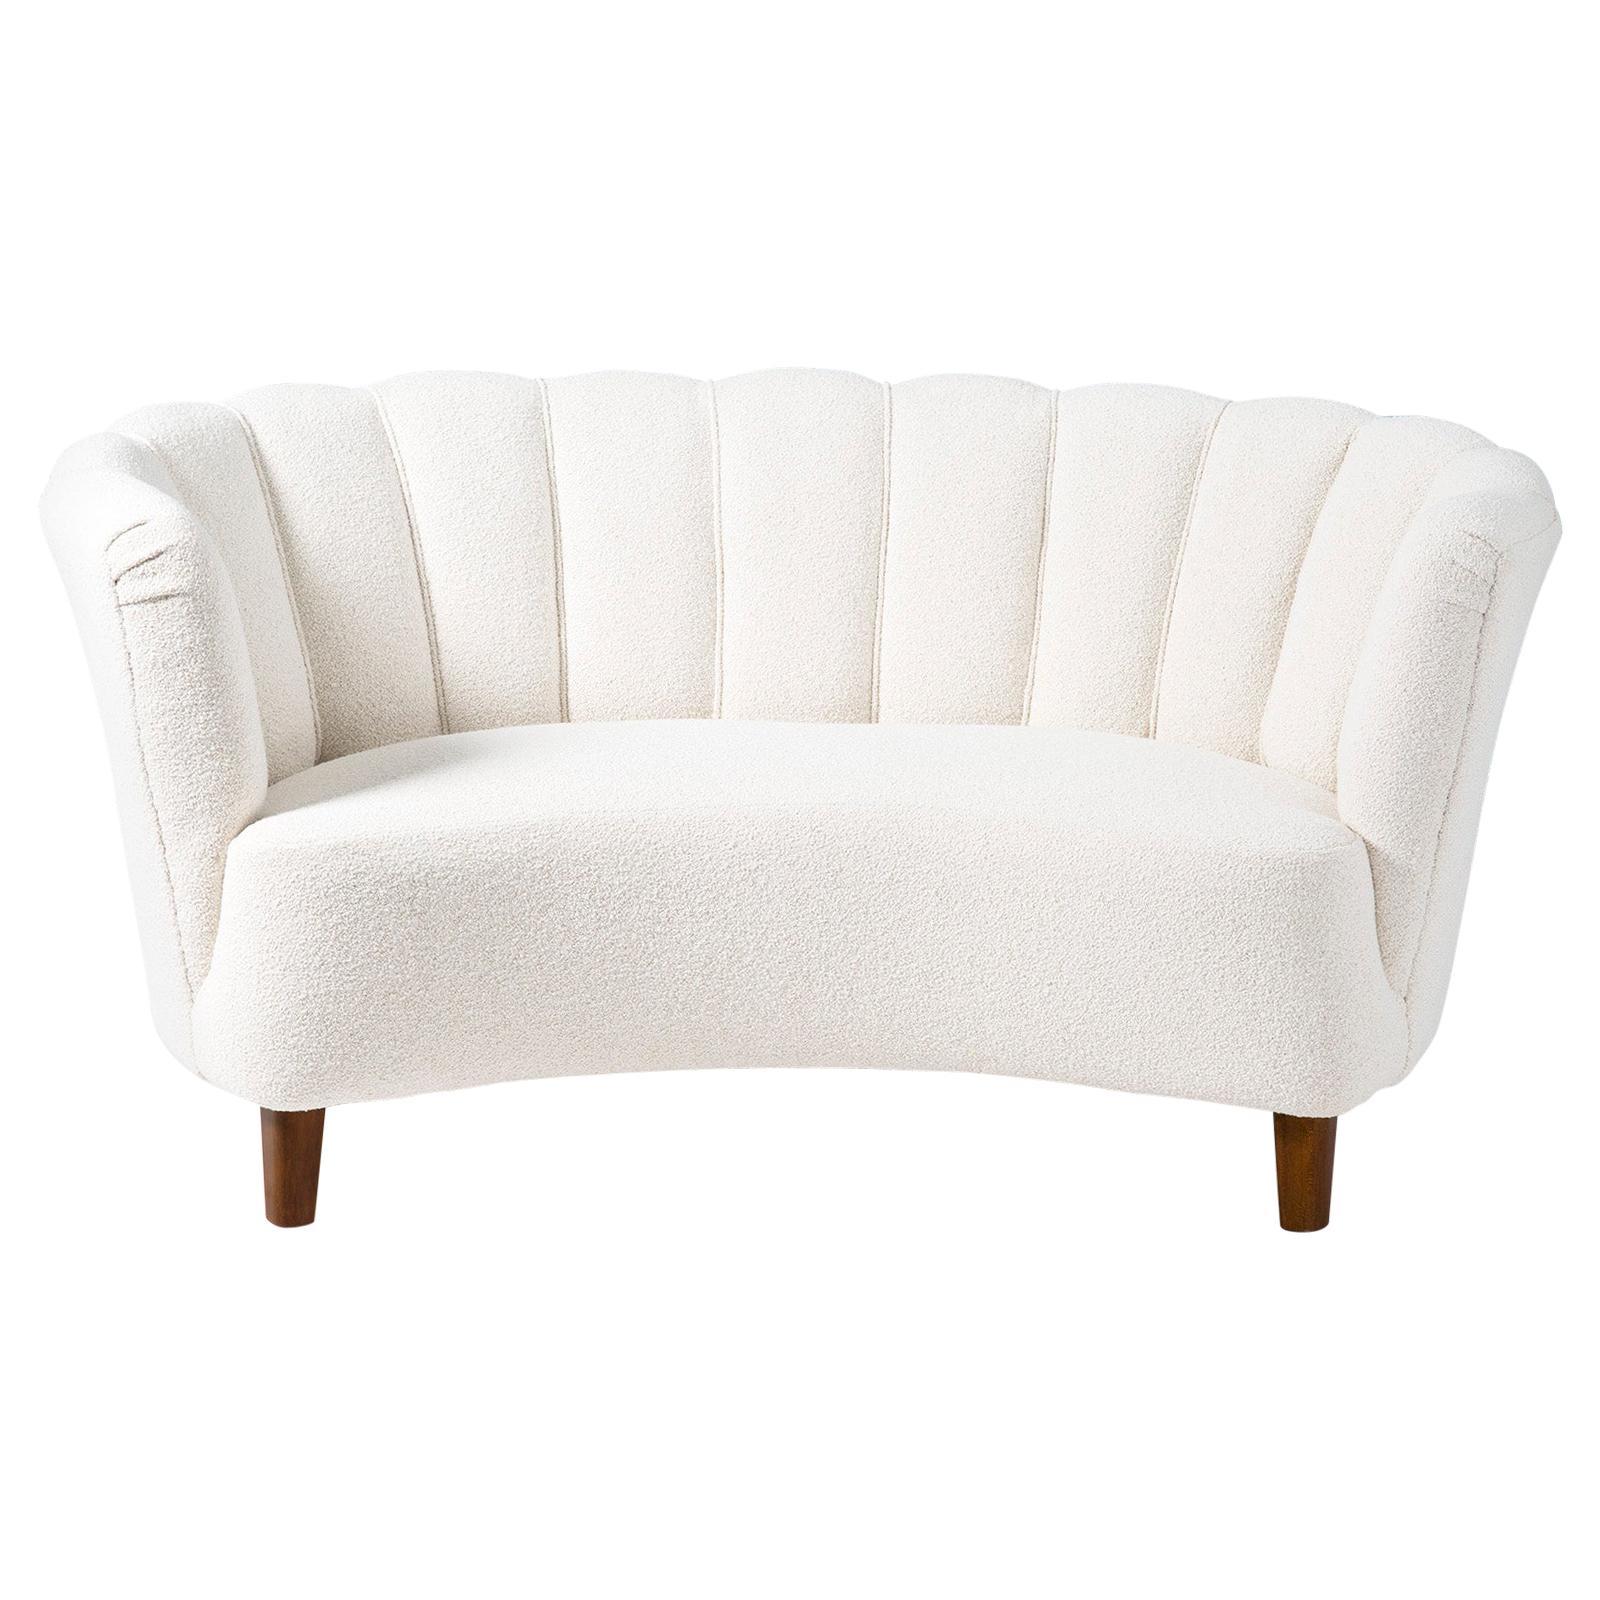 1940s Boucle Wool Danish Loveseat Sofa